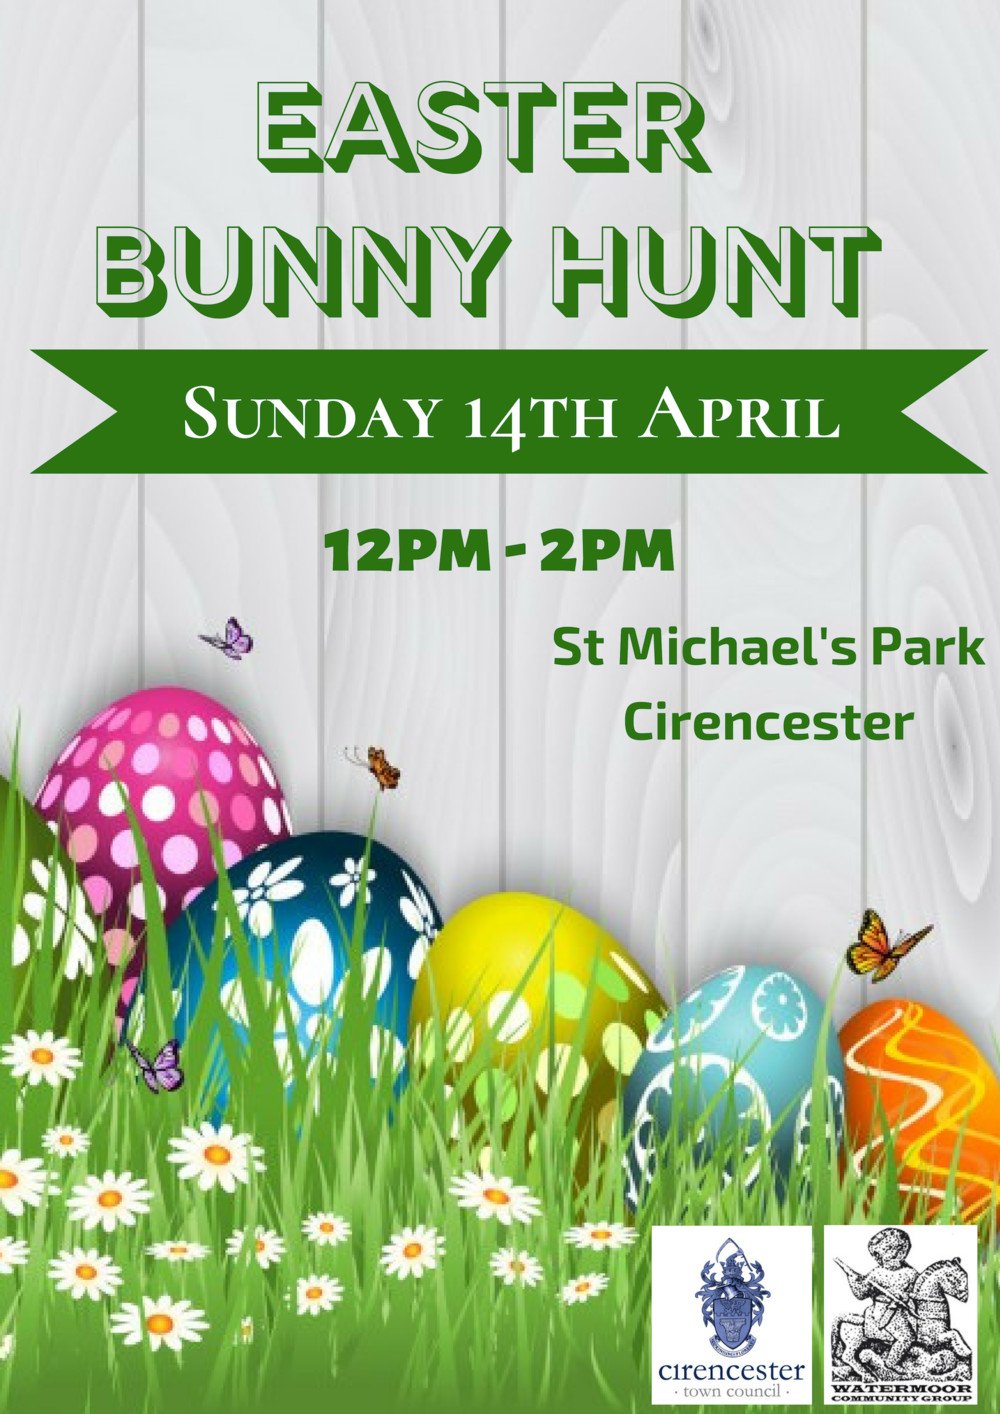 Easter Bunny Hunt Poster.png